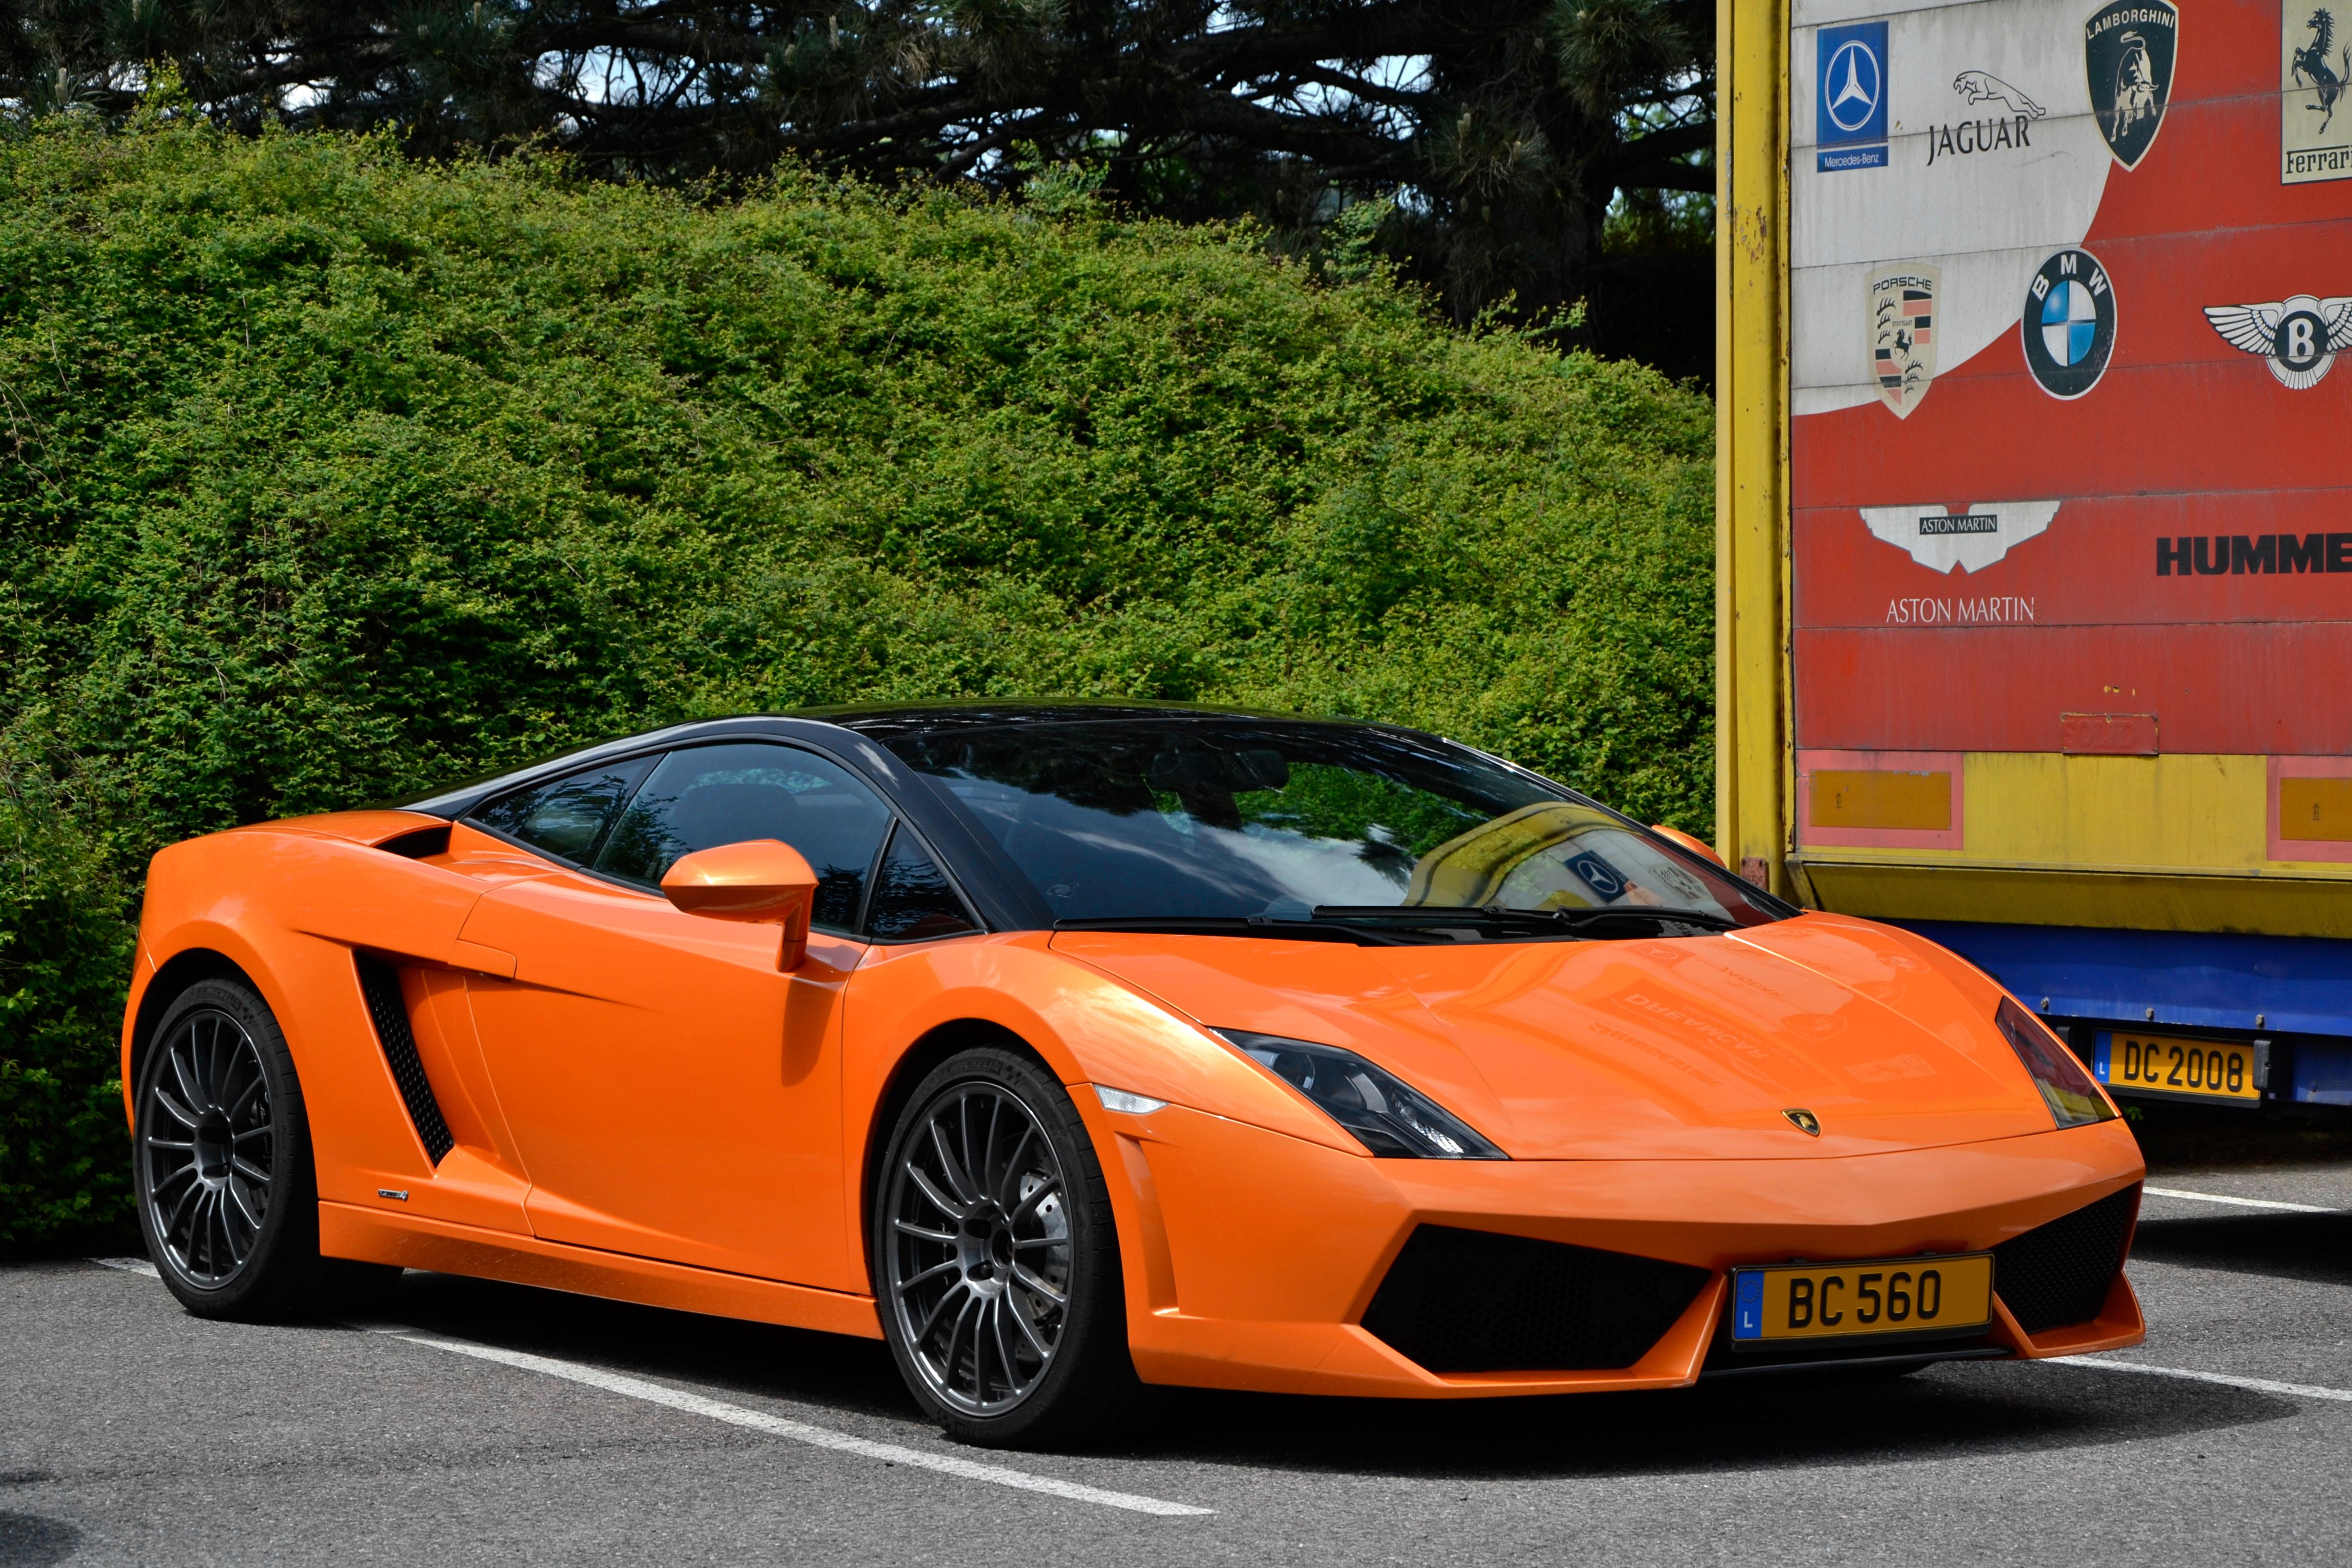 2016 Lamborghini Gallardo >> File Lamborghini Gallardo Lp 560 4 Bicolore Flickr Alexandre